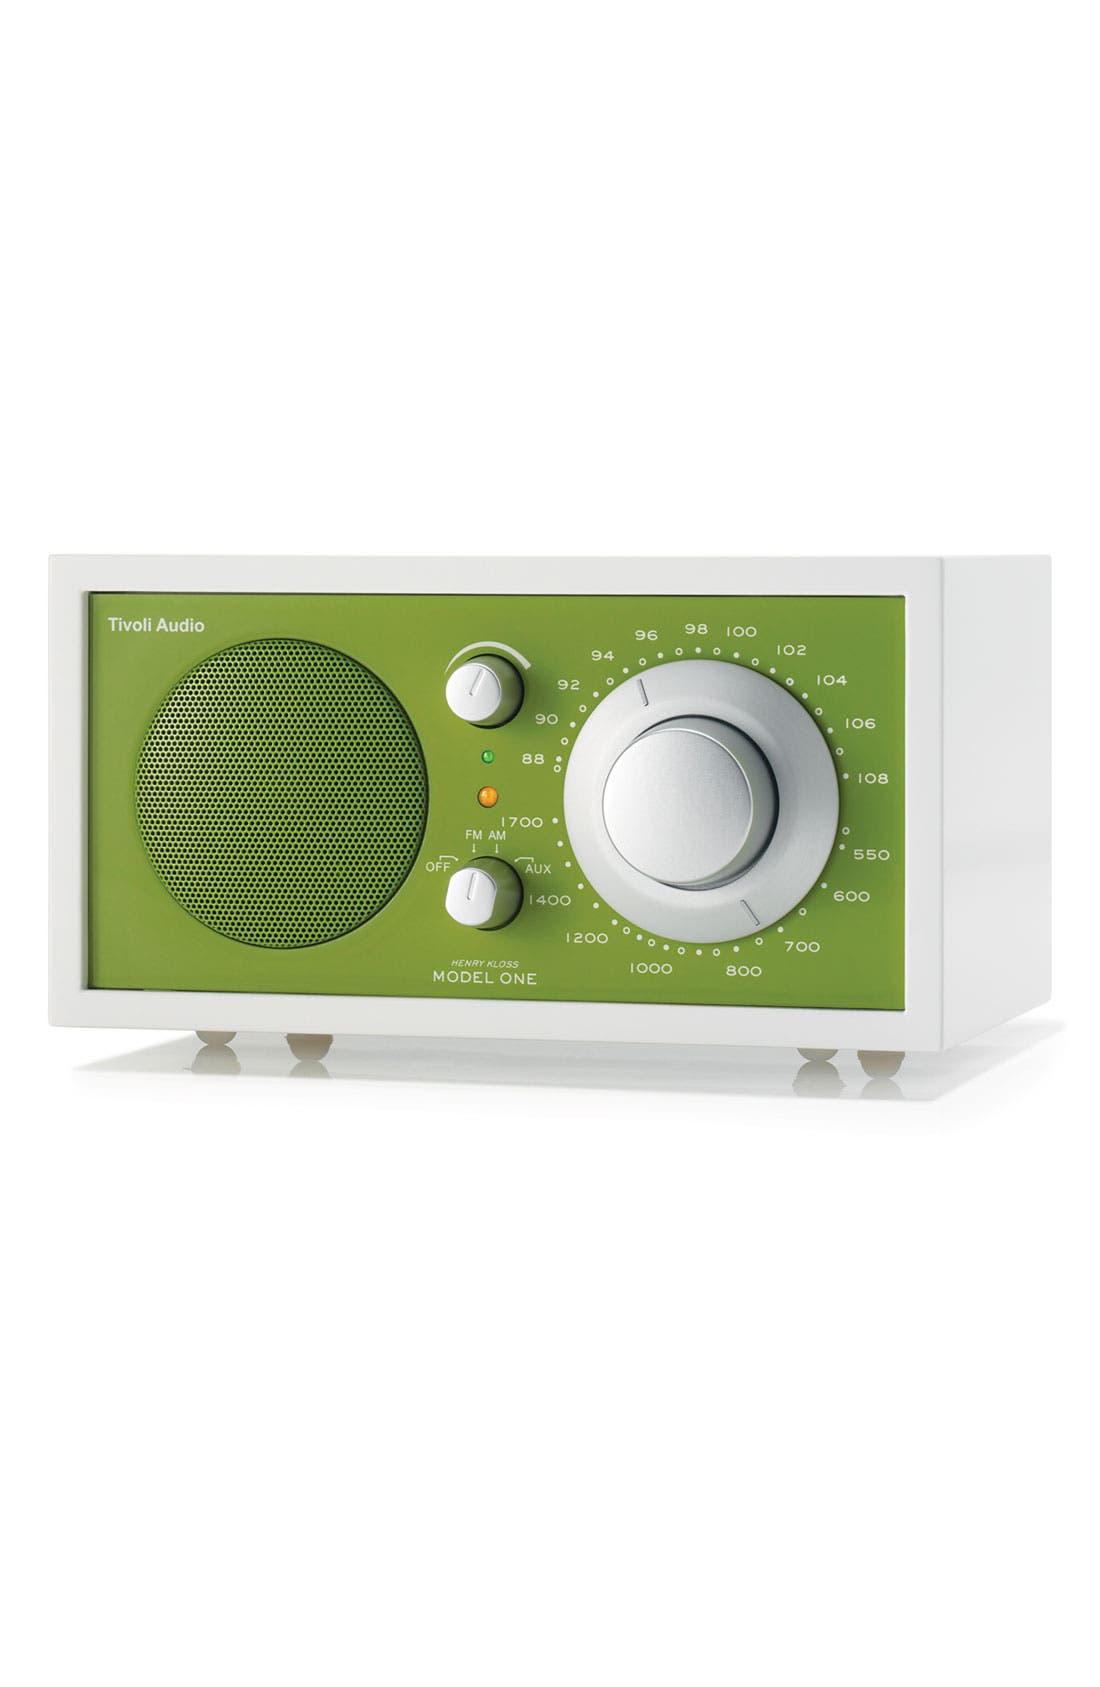 Alternate Image 1 Selected - Tivoli Audio 'Model One®' AM/FM Radio